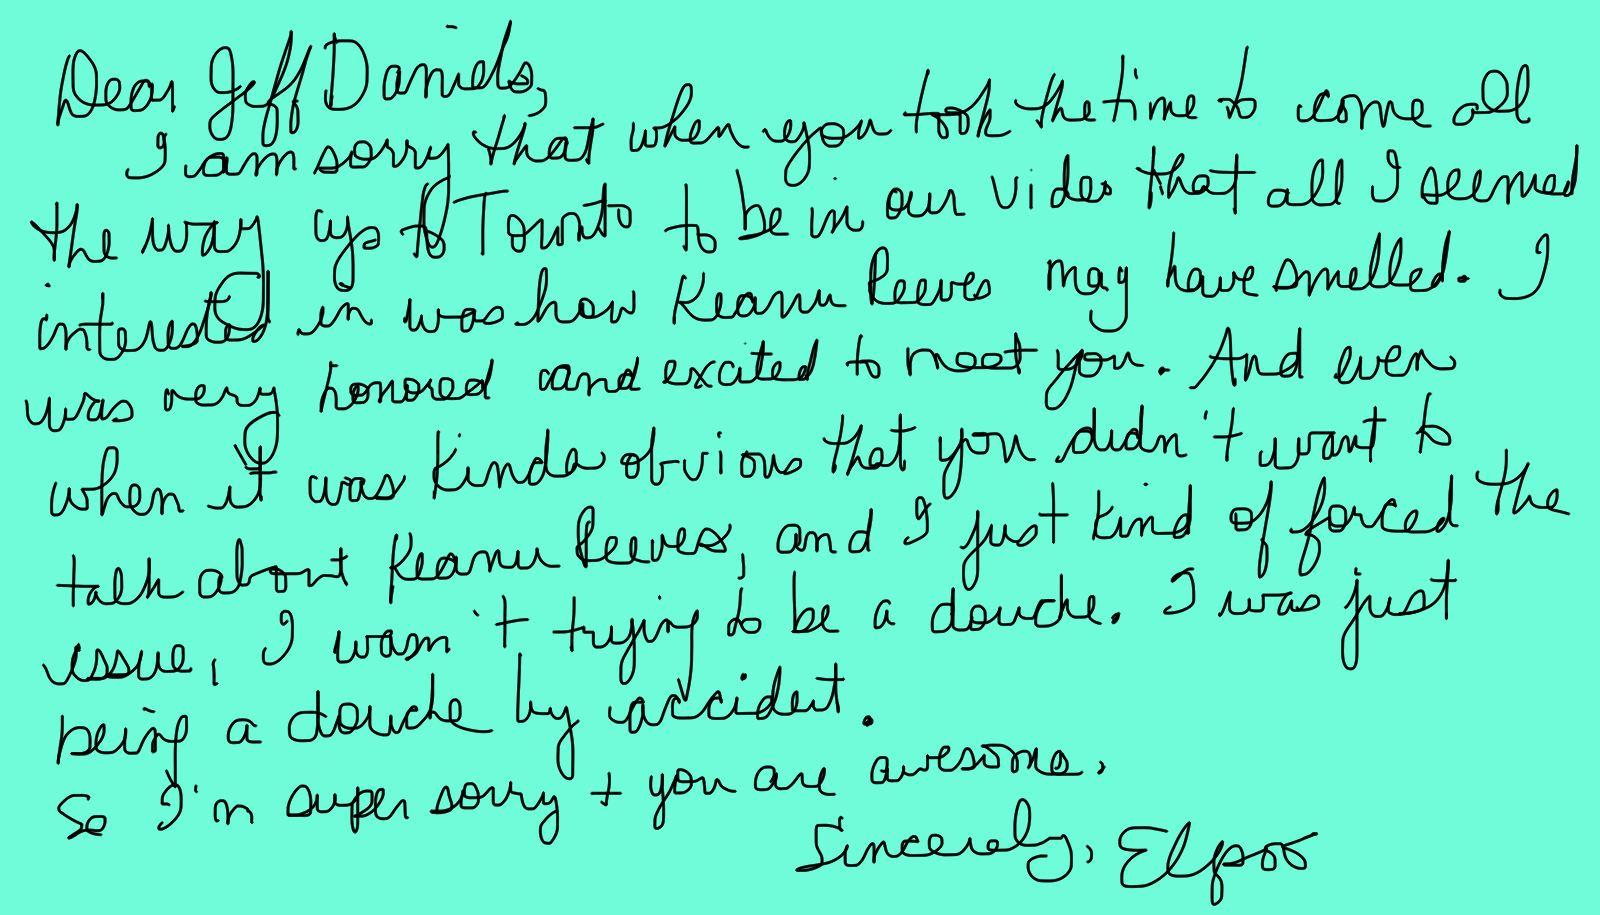 http://1.bp.blogspot.com/-SpdET-Fb6tA/T6-ac_w4CKI/AAAAAAAADhY/IhkOxu0mT2M/s1600/letter+to+Jeff+Daniels.jpg